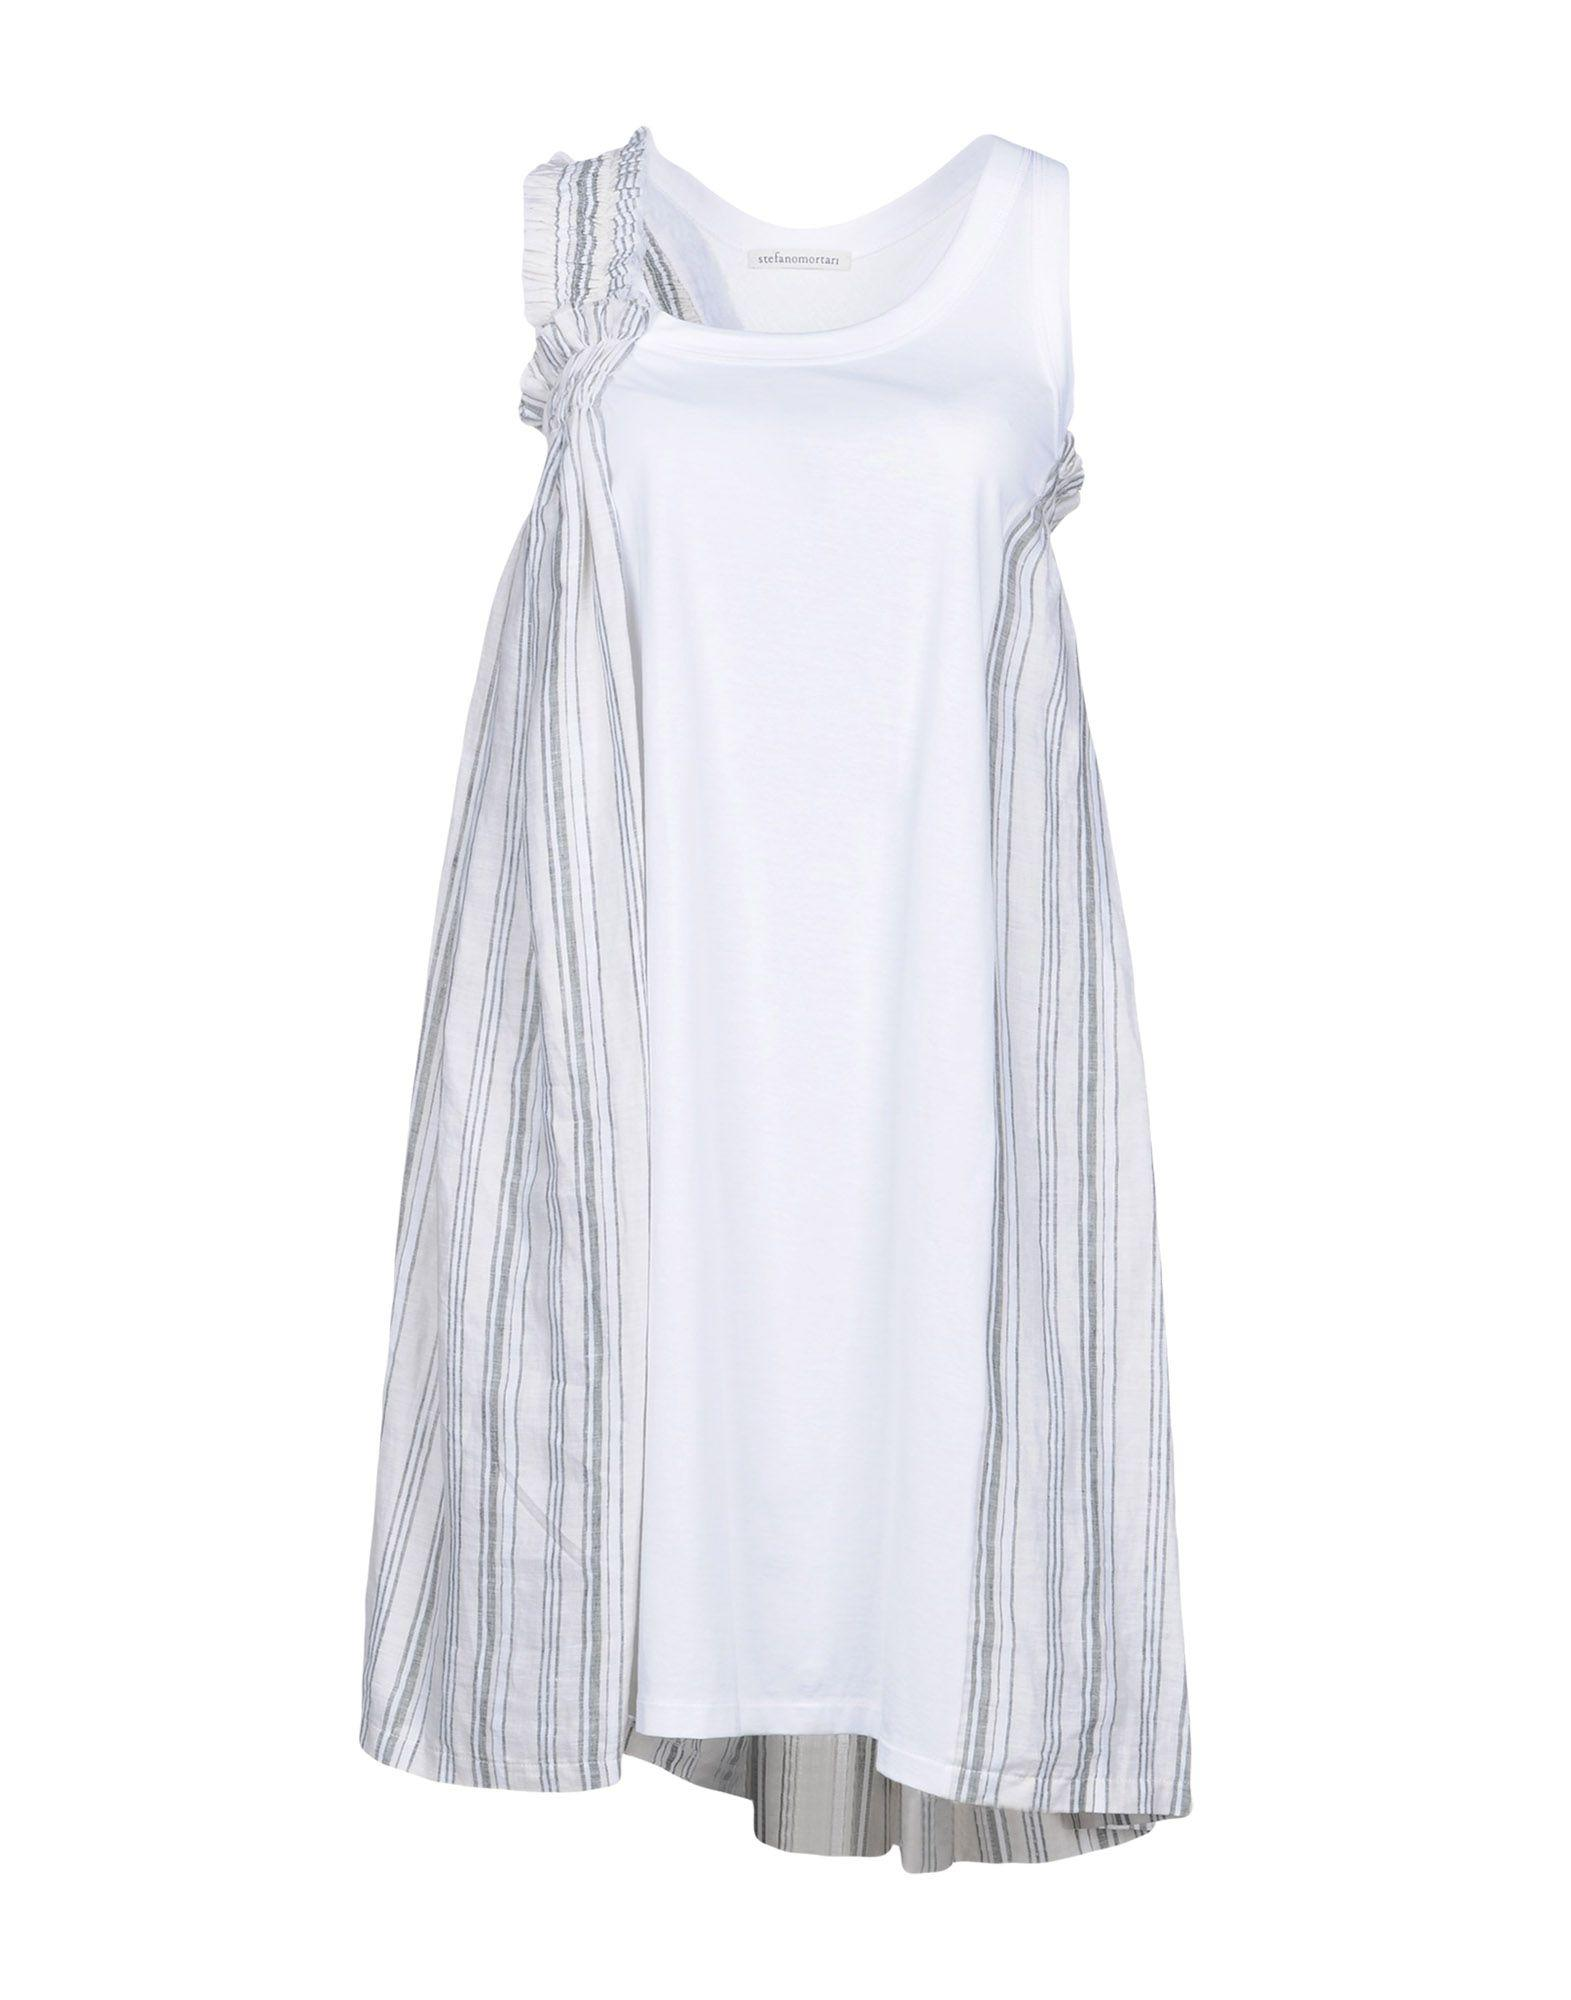 Stefano Mortari Knee-length Dress In White